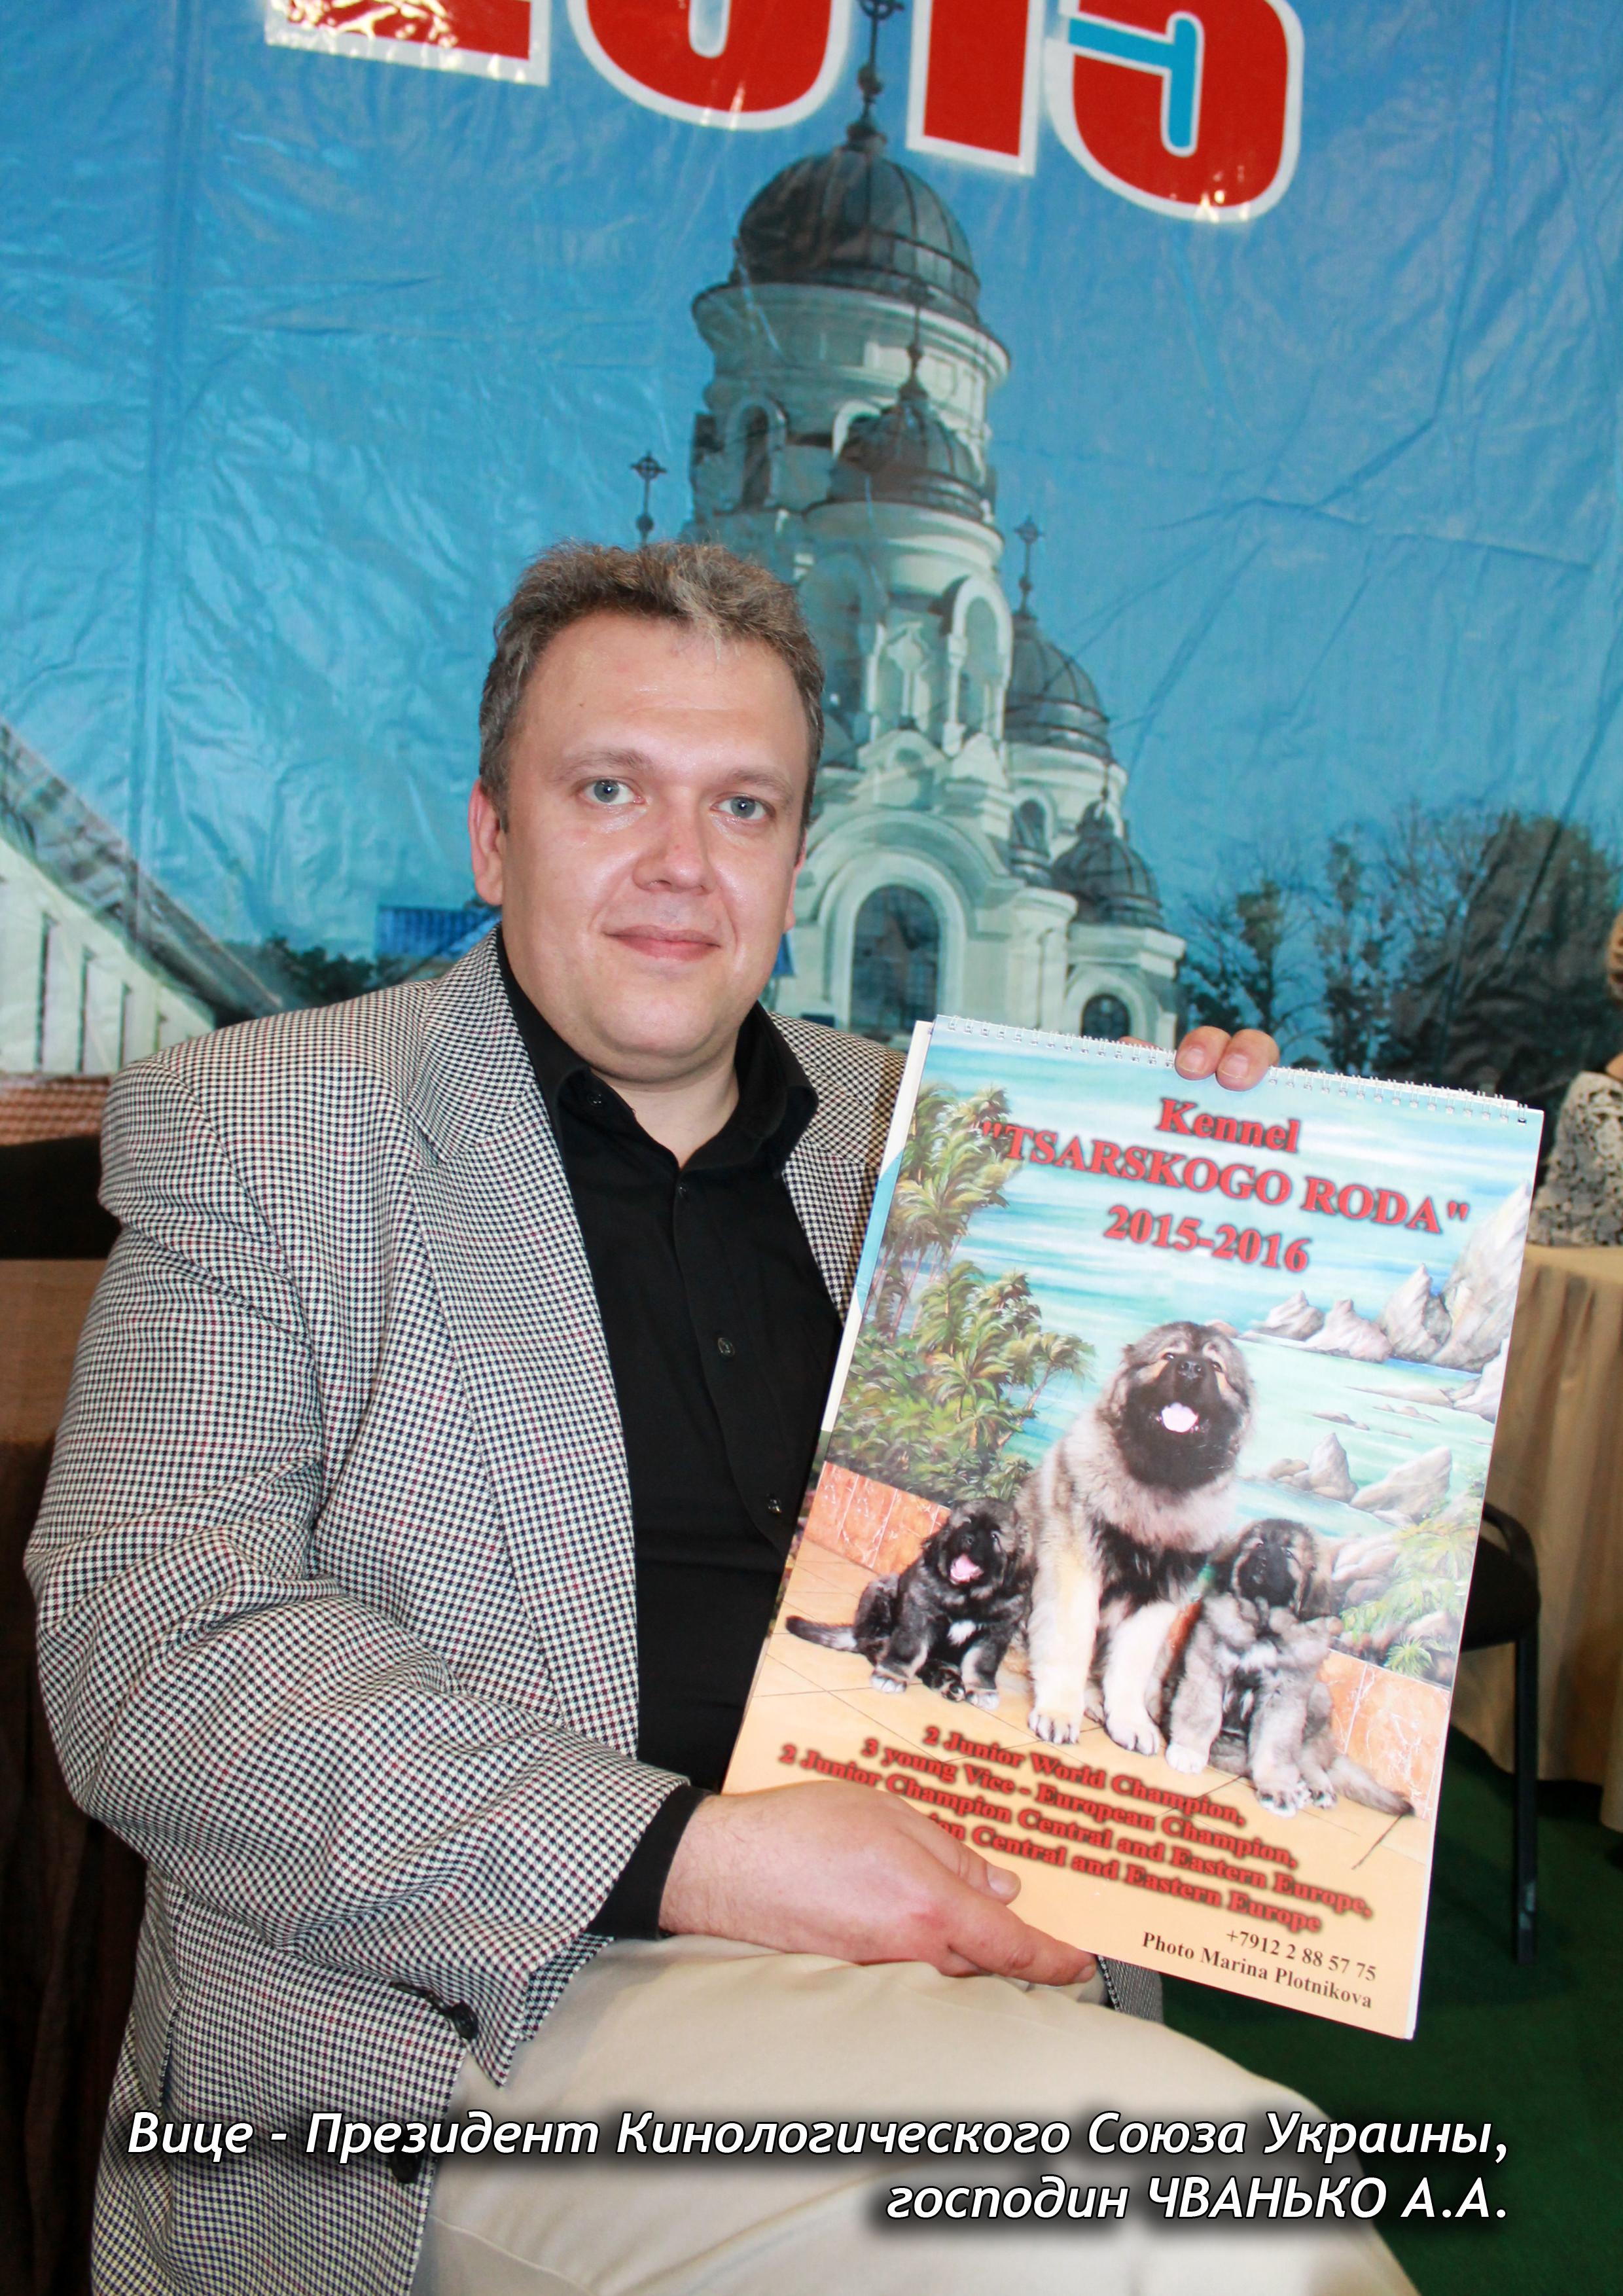 Vitce - Prezident Kinologicheskogo Soiuza Ukrainy`, gos. CHVAN`KO A.A.